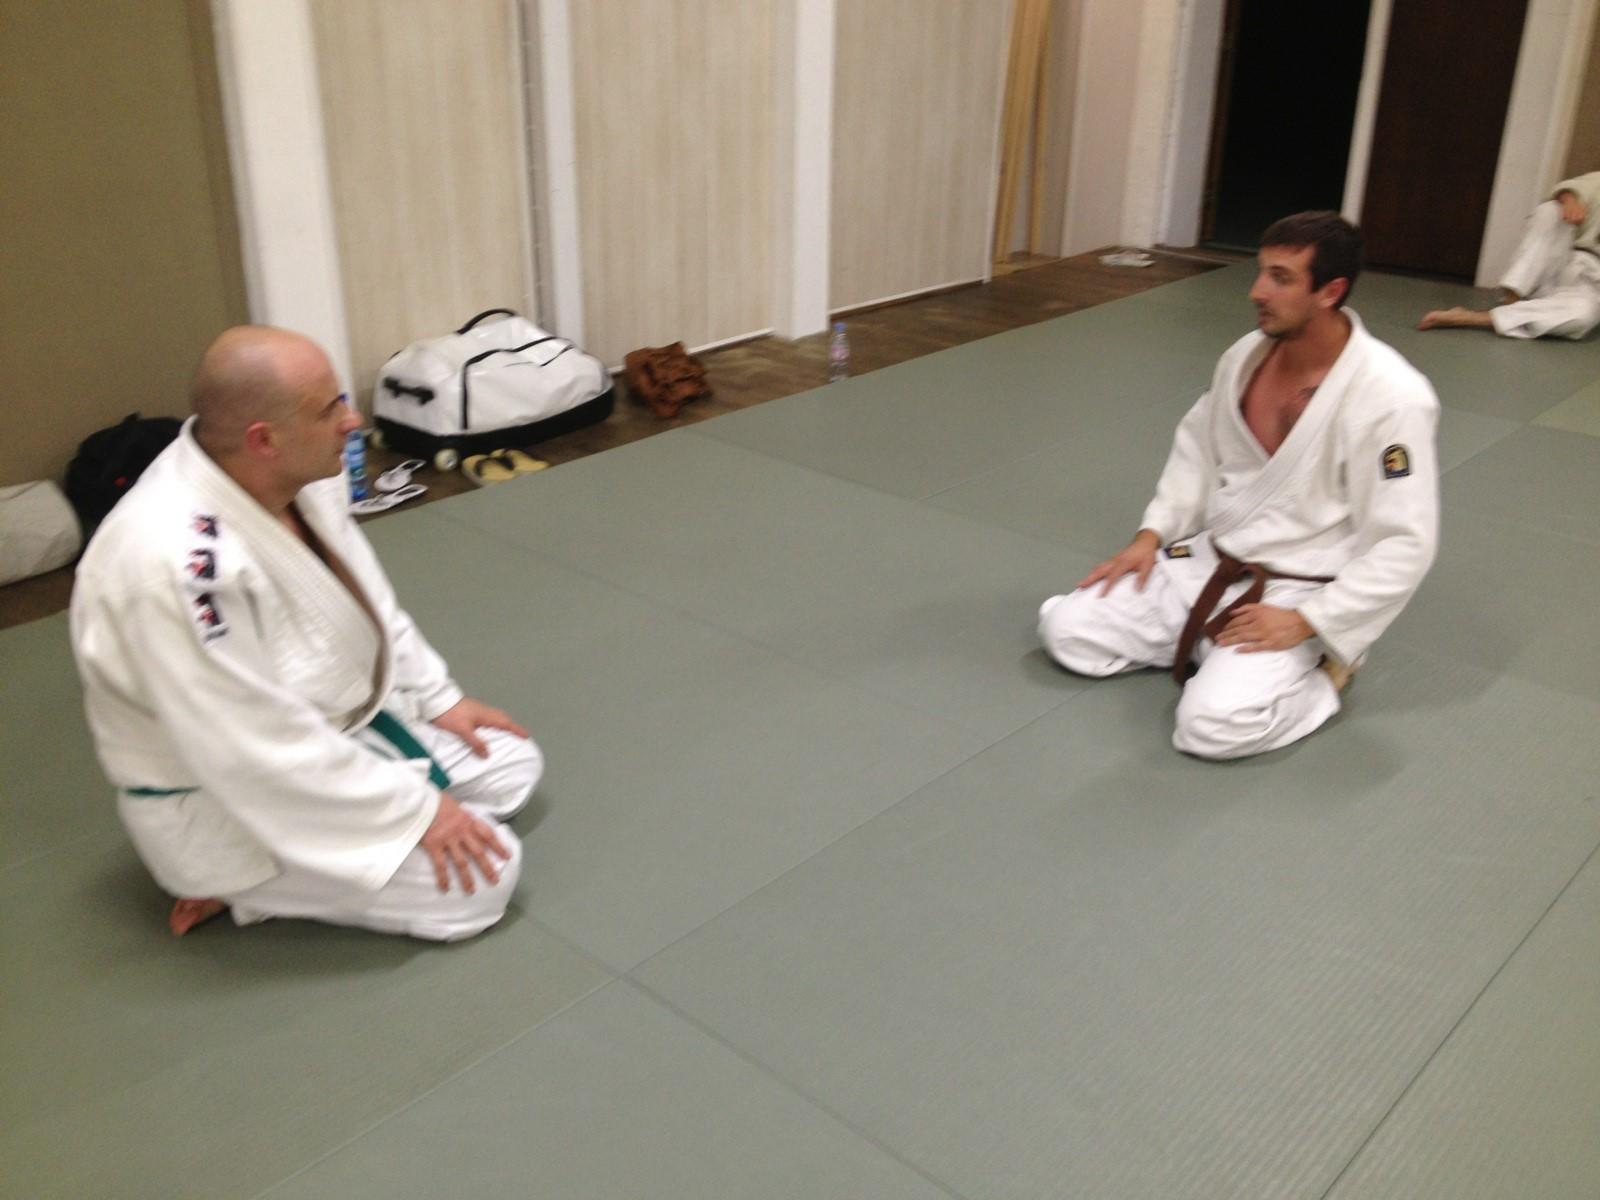 jujitsu-efjjsd-novembre-2013 4